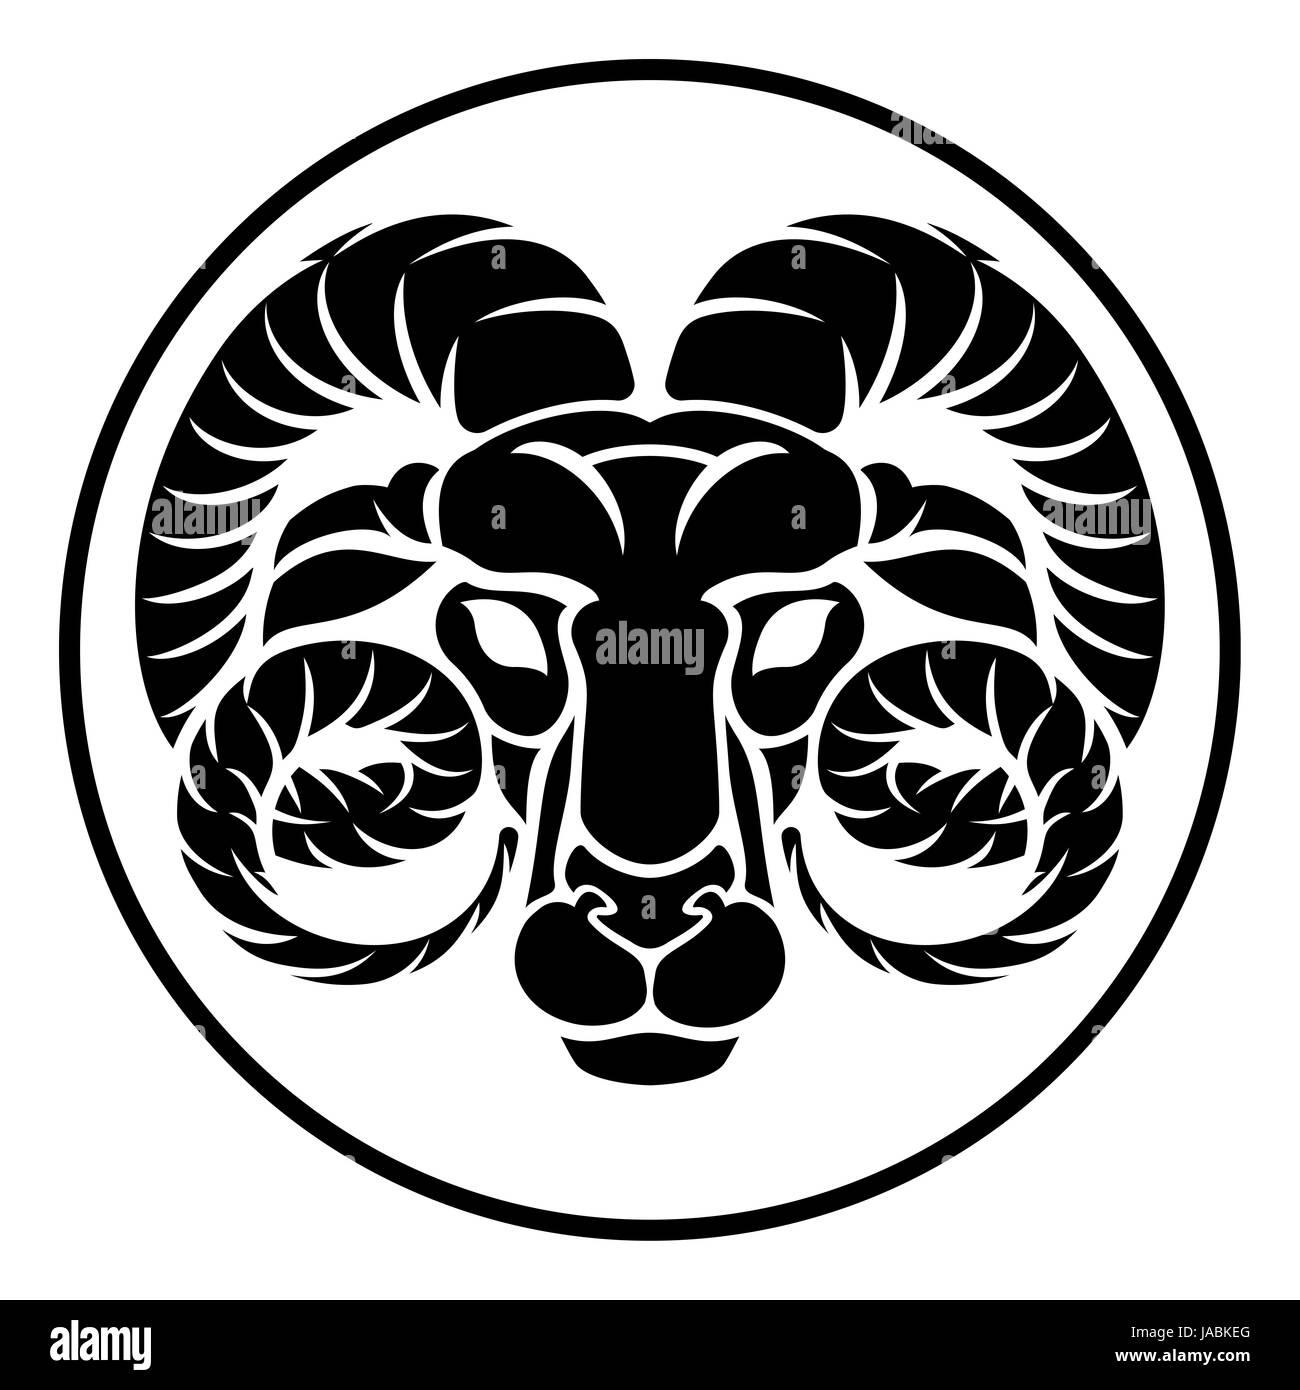 ae6b2b117 A circular Aries ram horoscope astrology zodiac sign icon Stock ...